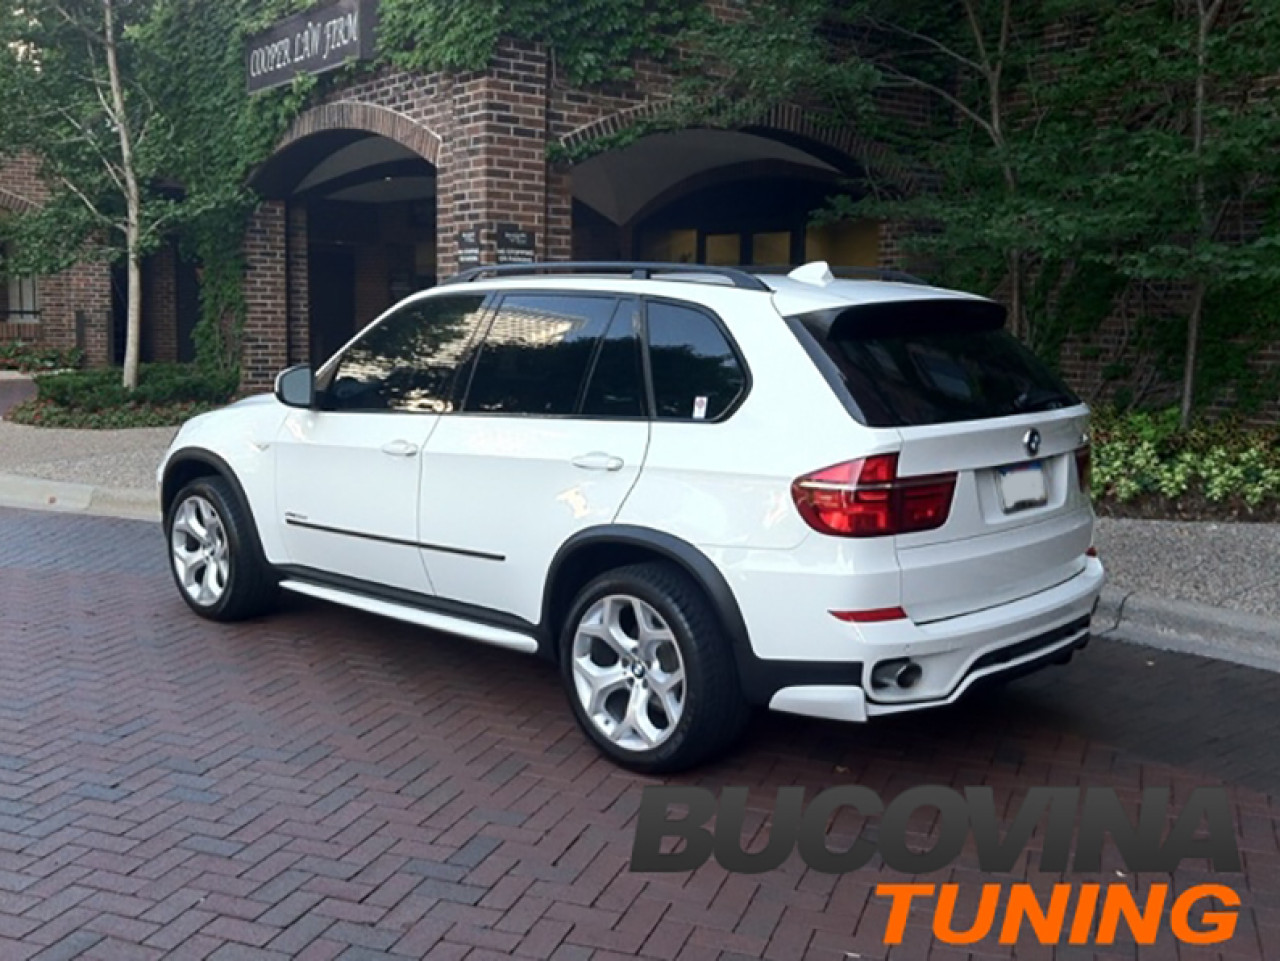 KIT AERODINAMIC BMW X5 FACELIFT